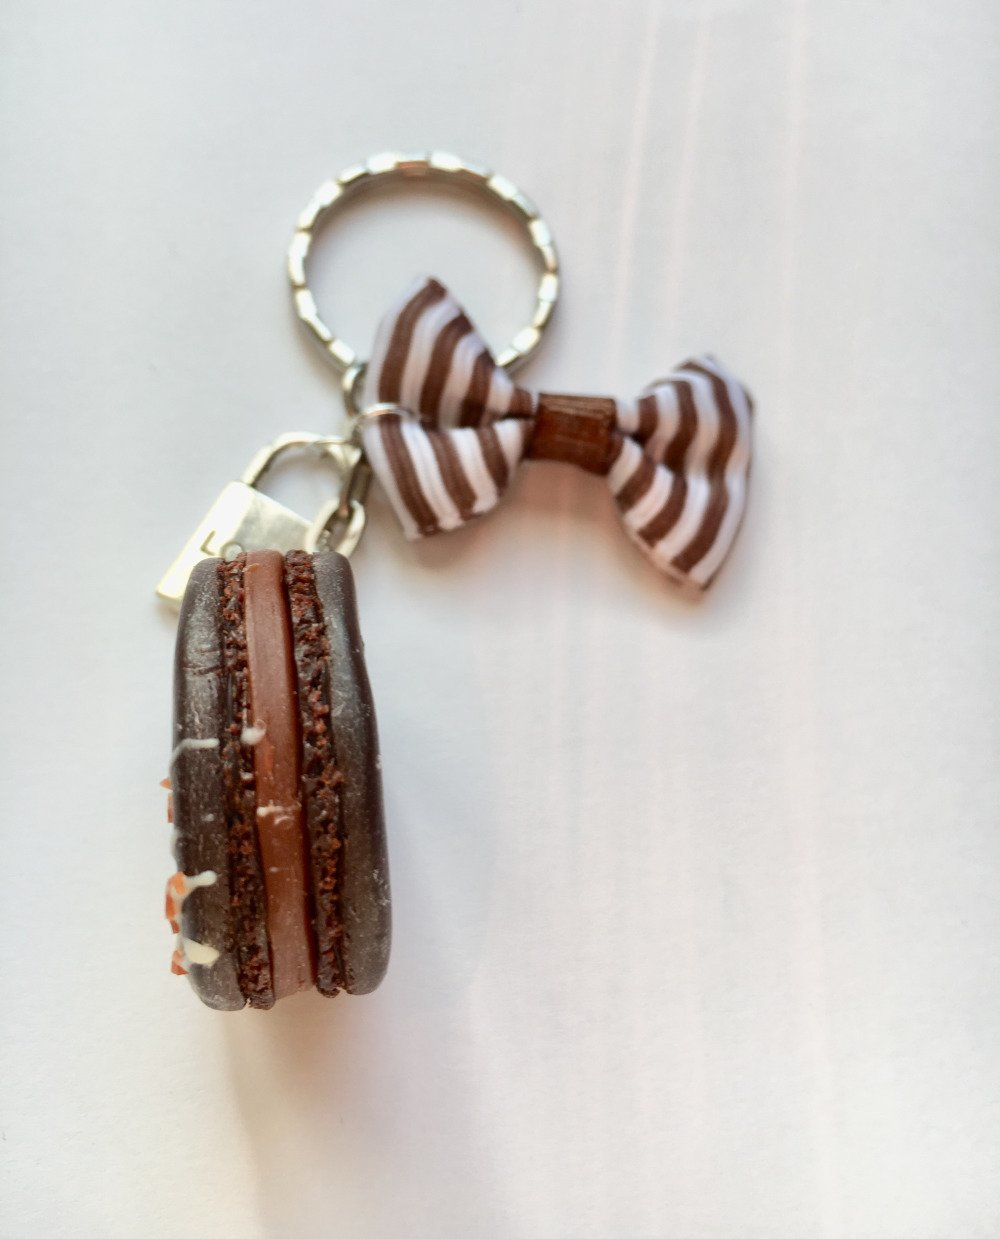 porte-clés macaron chocolat